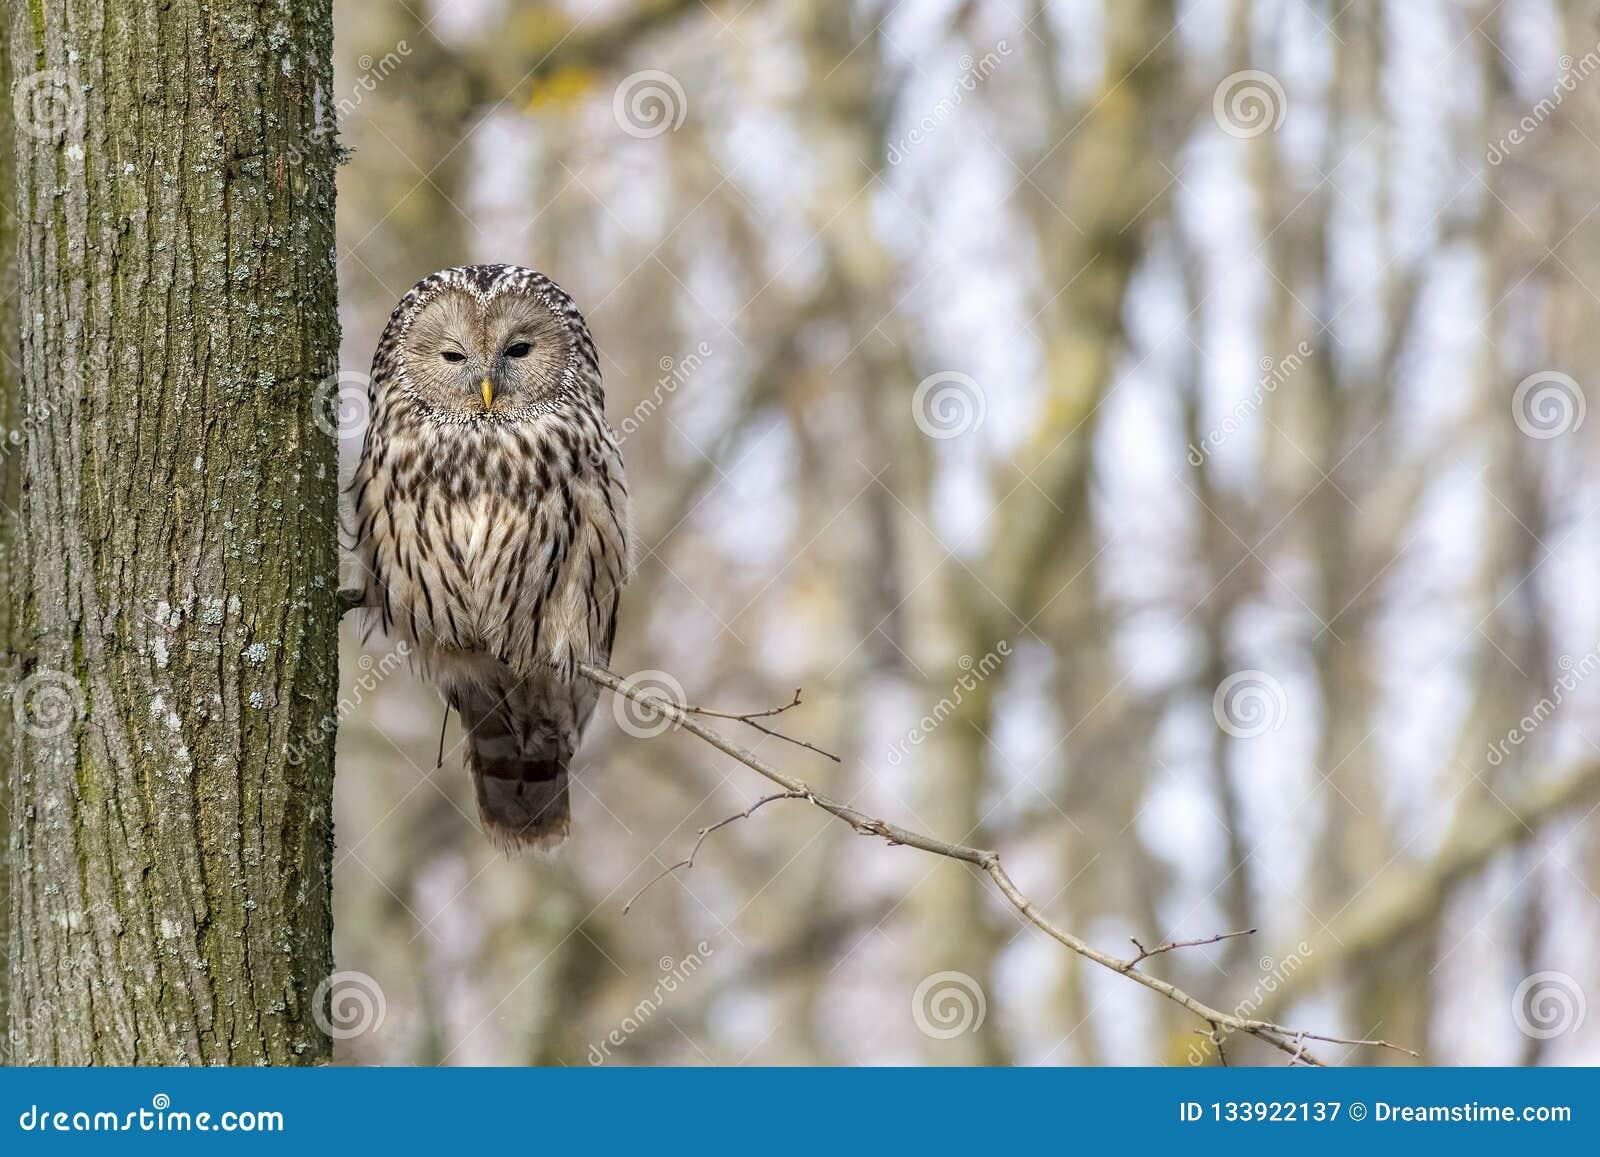 Peaceful Owl